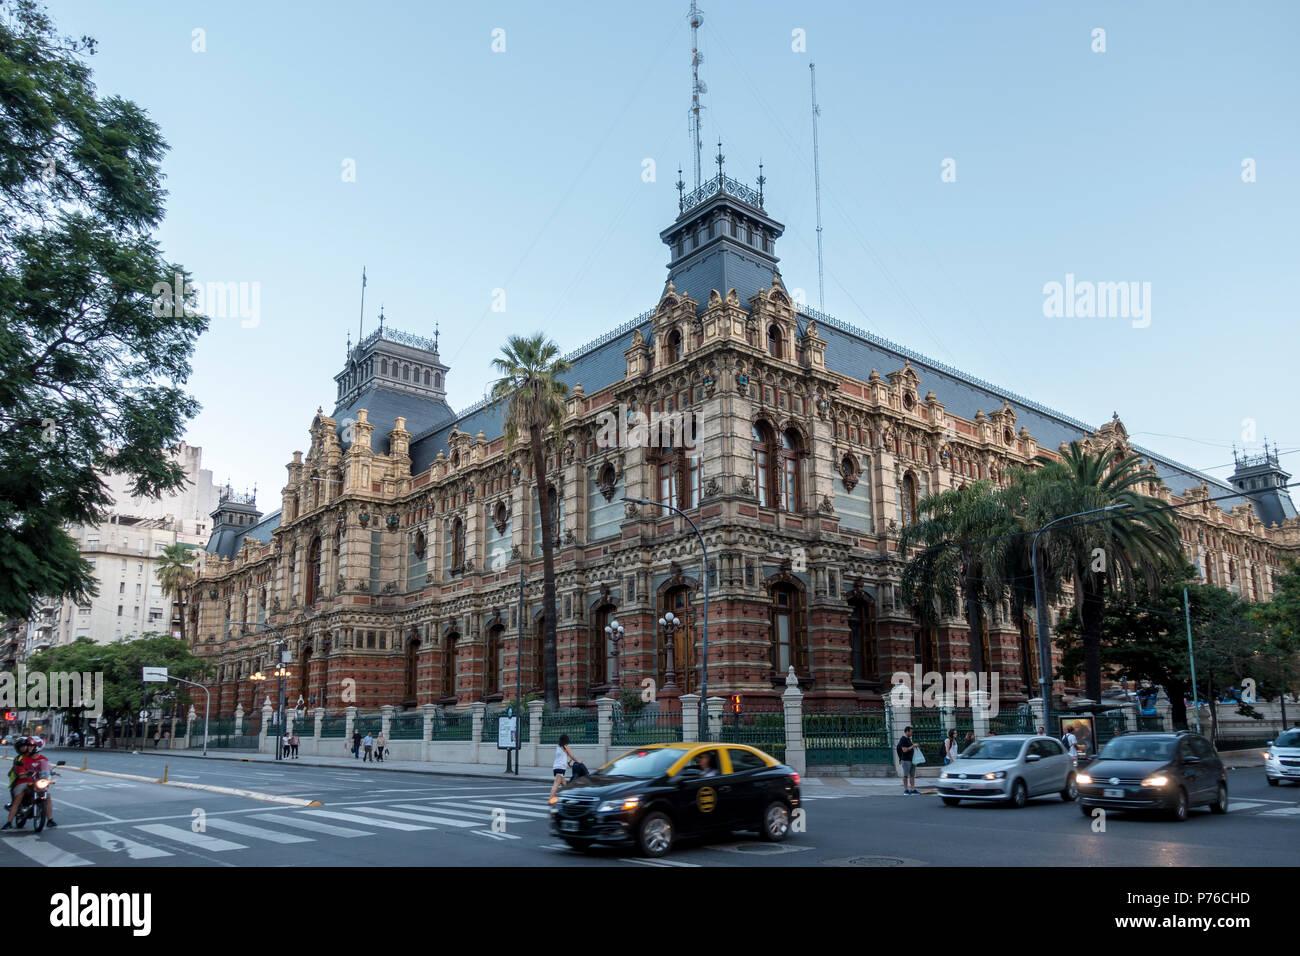 Exterior of the Water Company Palace in Avenida Cordoba, Barrio Norte, Buenos Aires Stock Photo